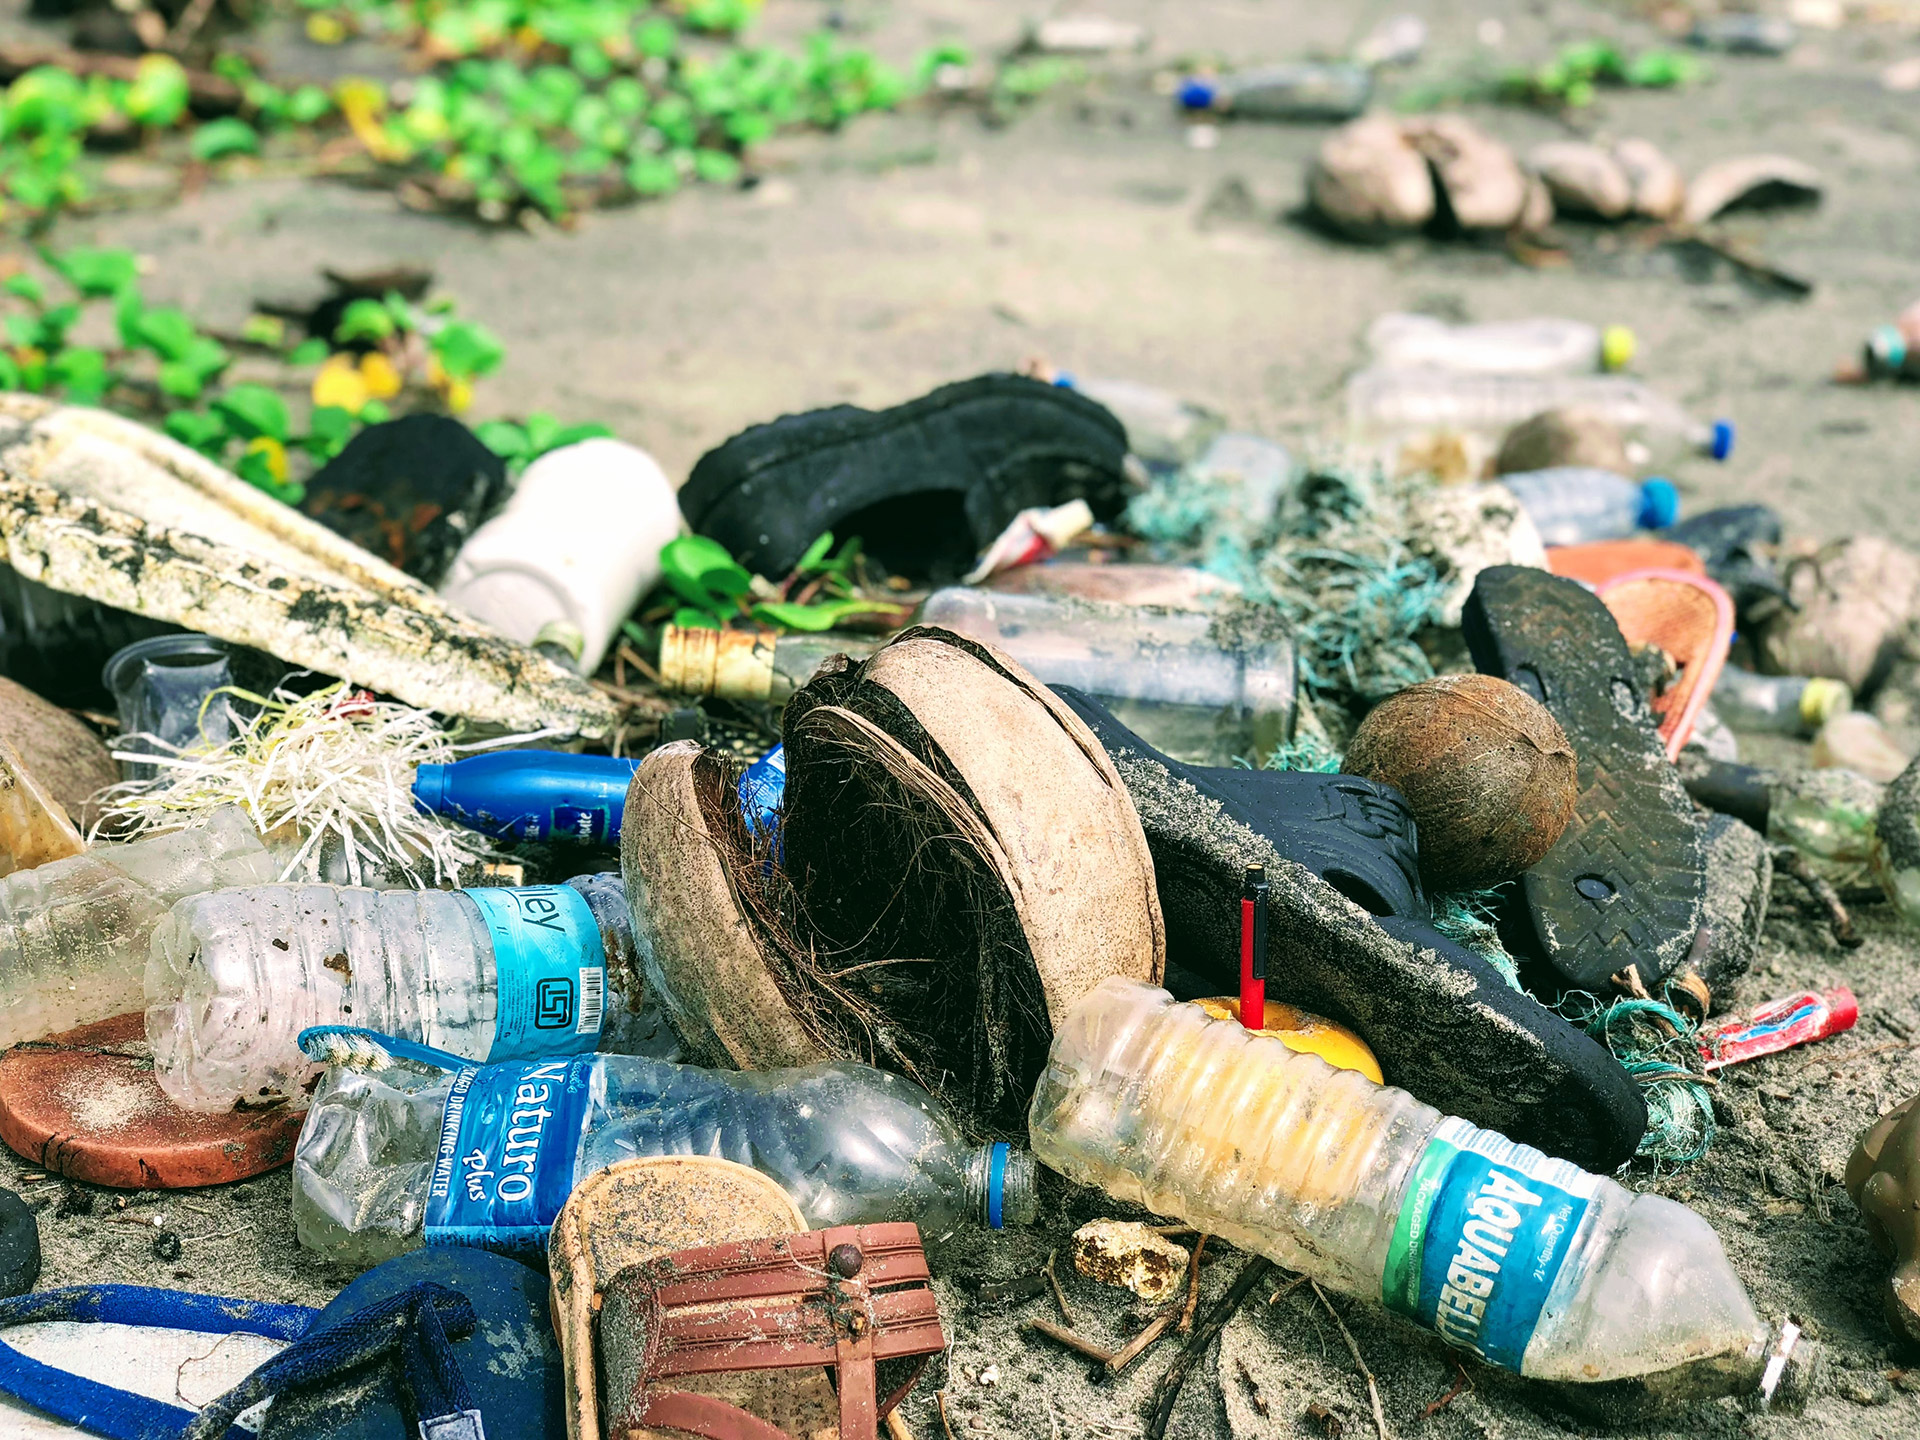 Gute Taten - Müll sammeln